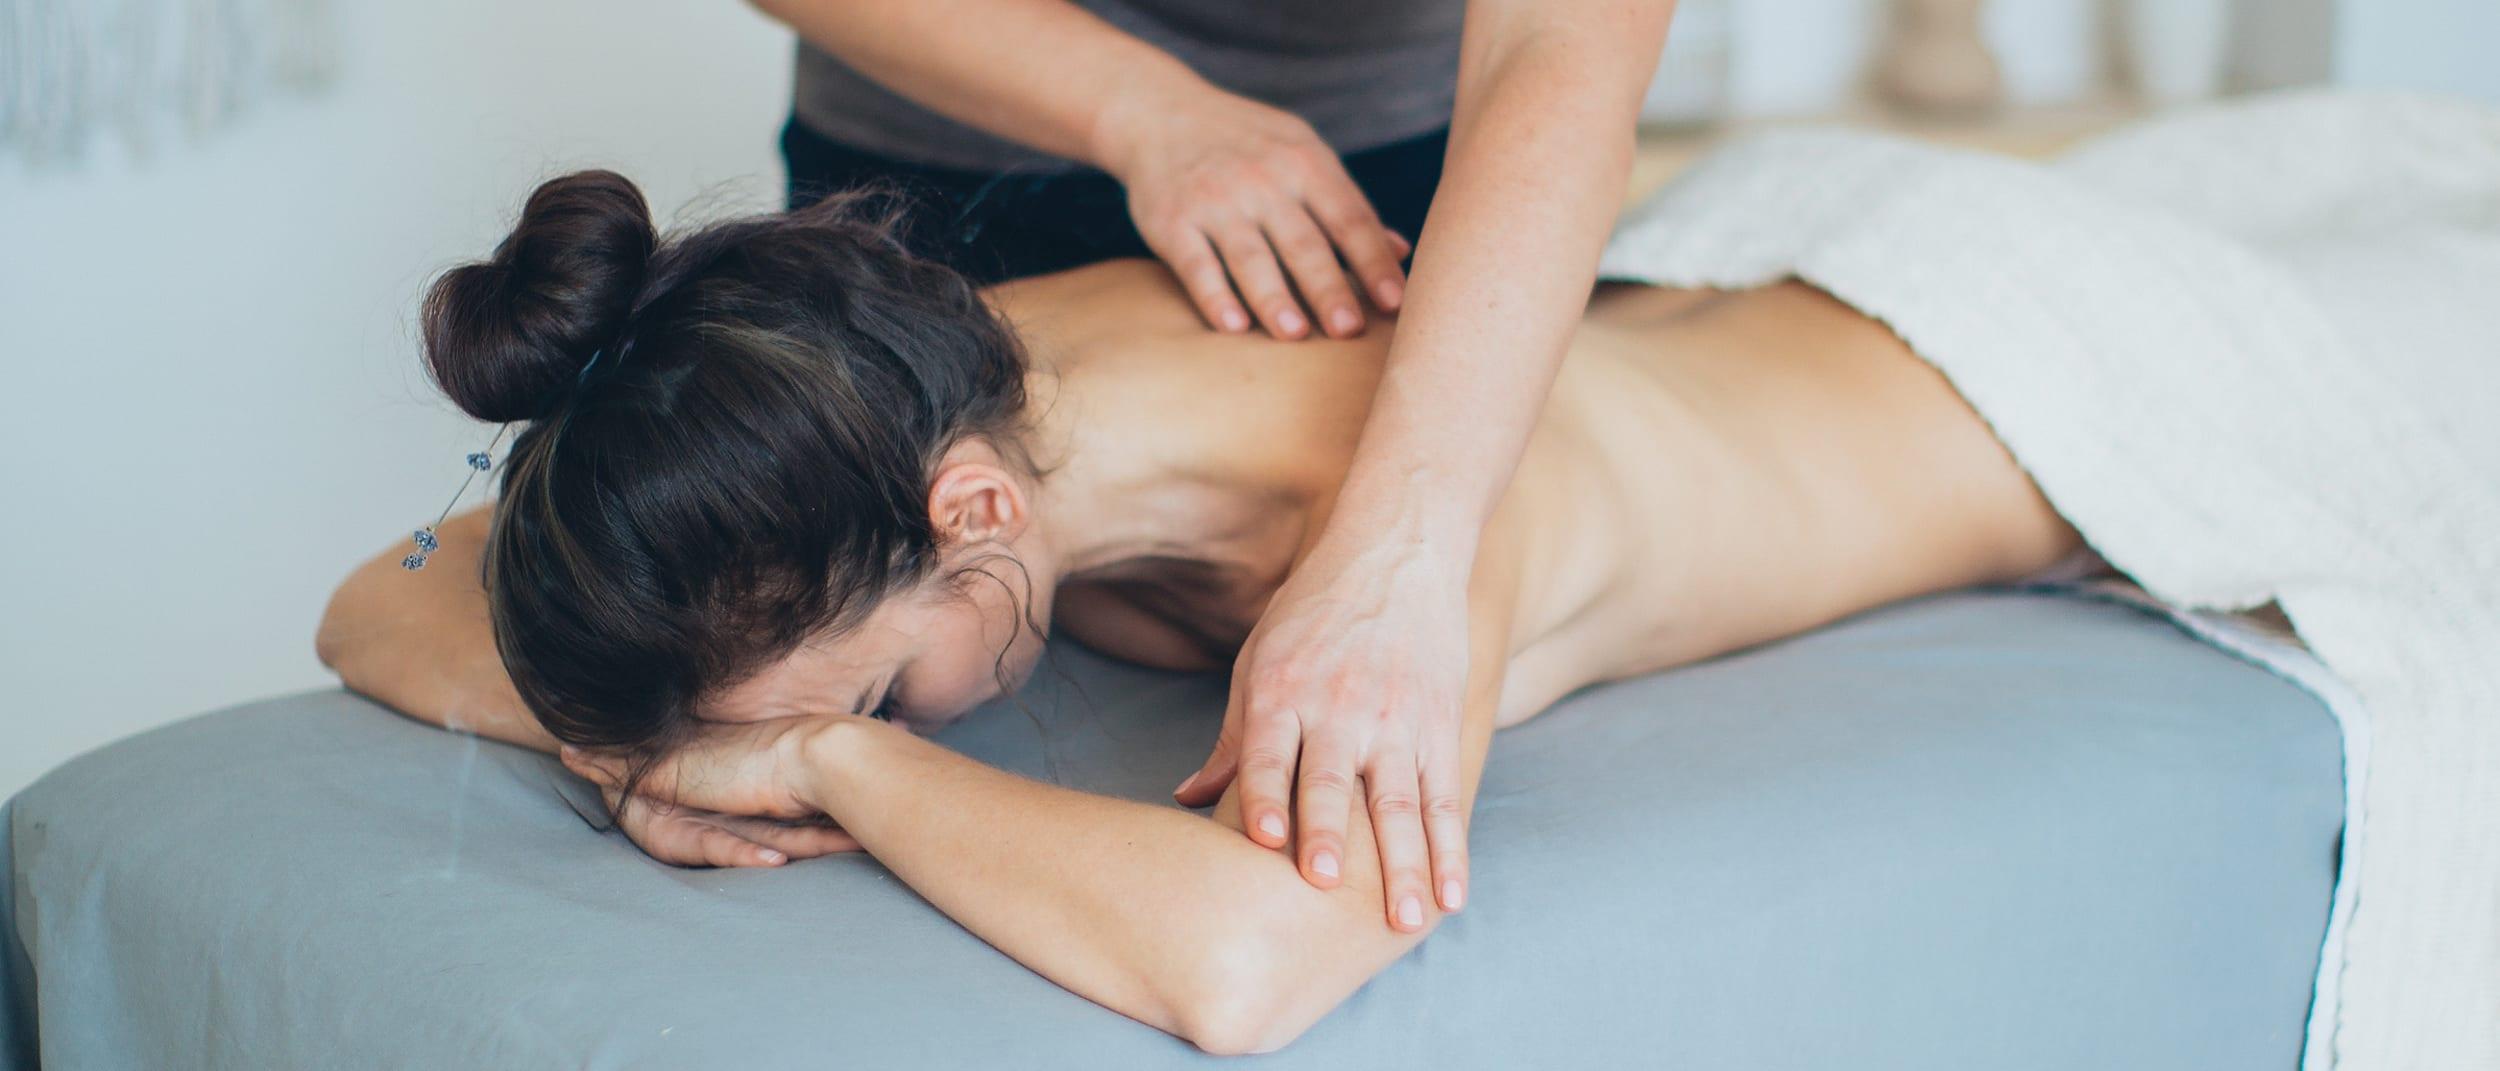 Westfield Plus Members Offer: Luxe Massage + Spa - 20% off